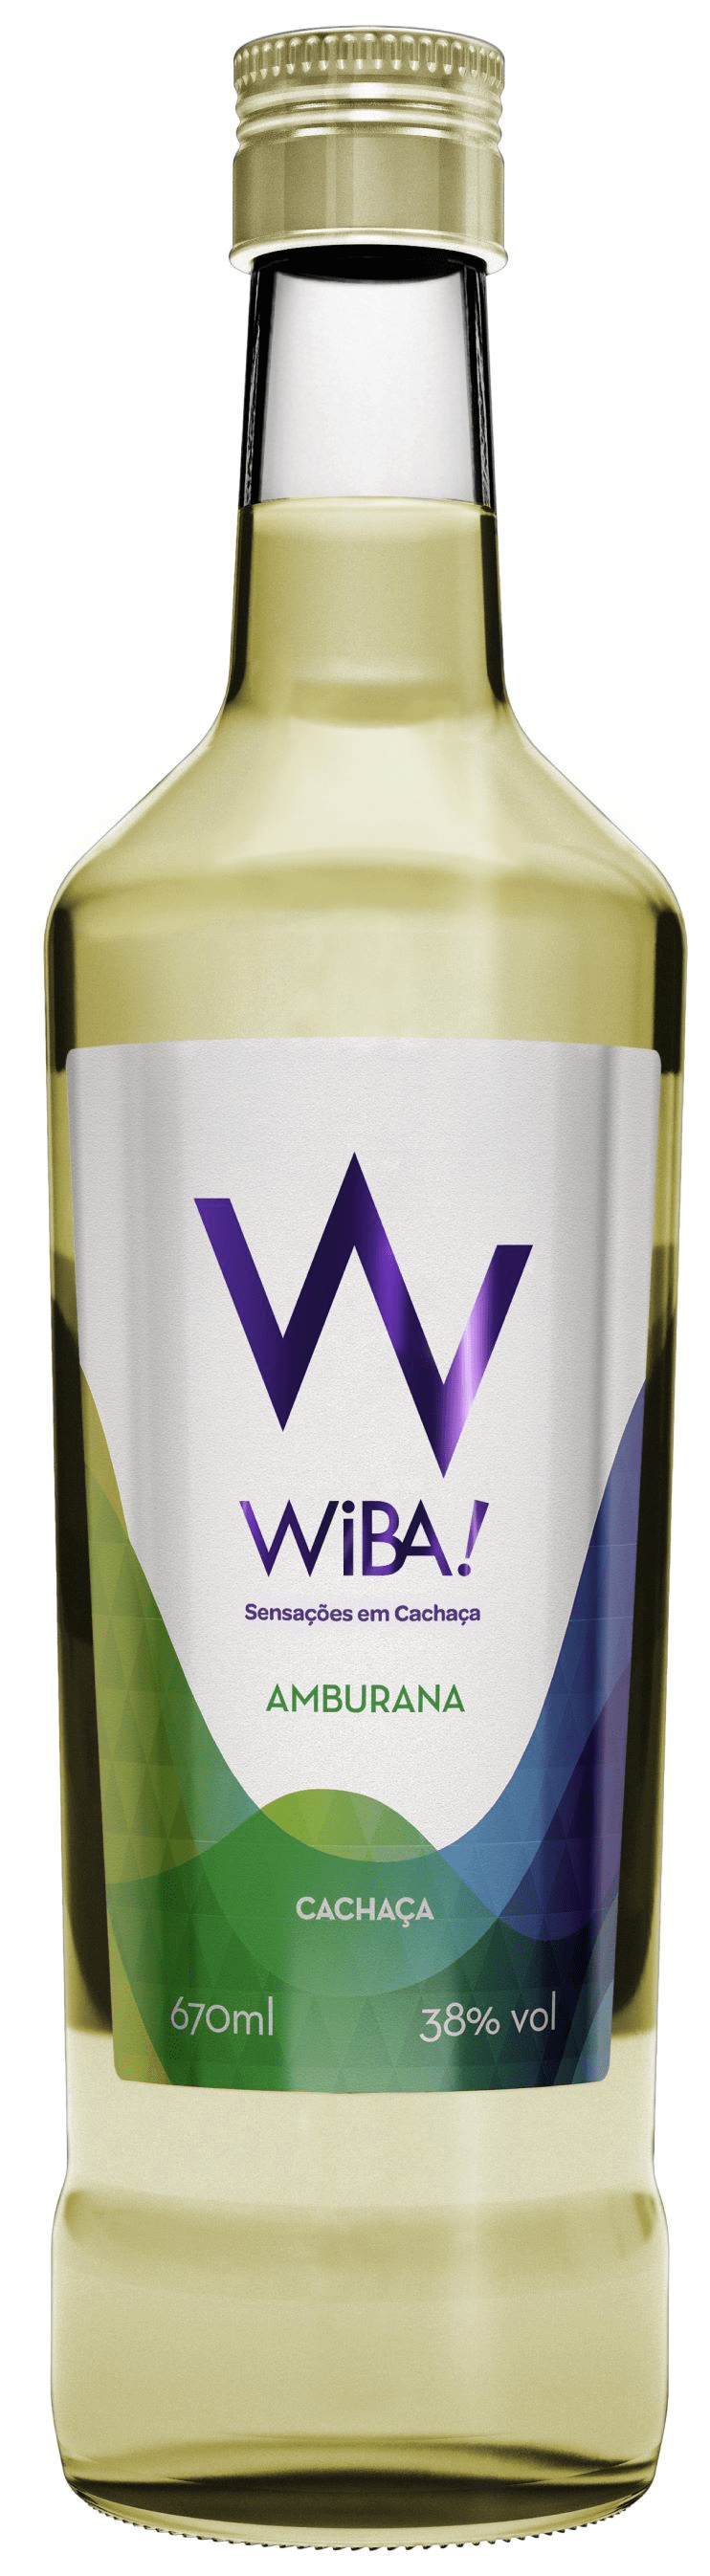 Cachaça WIBA Amburana Ouro  670 ml